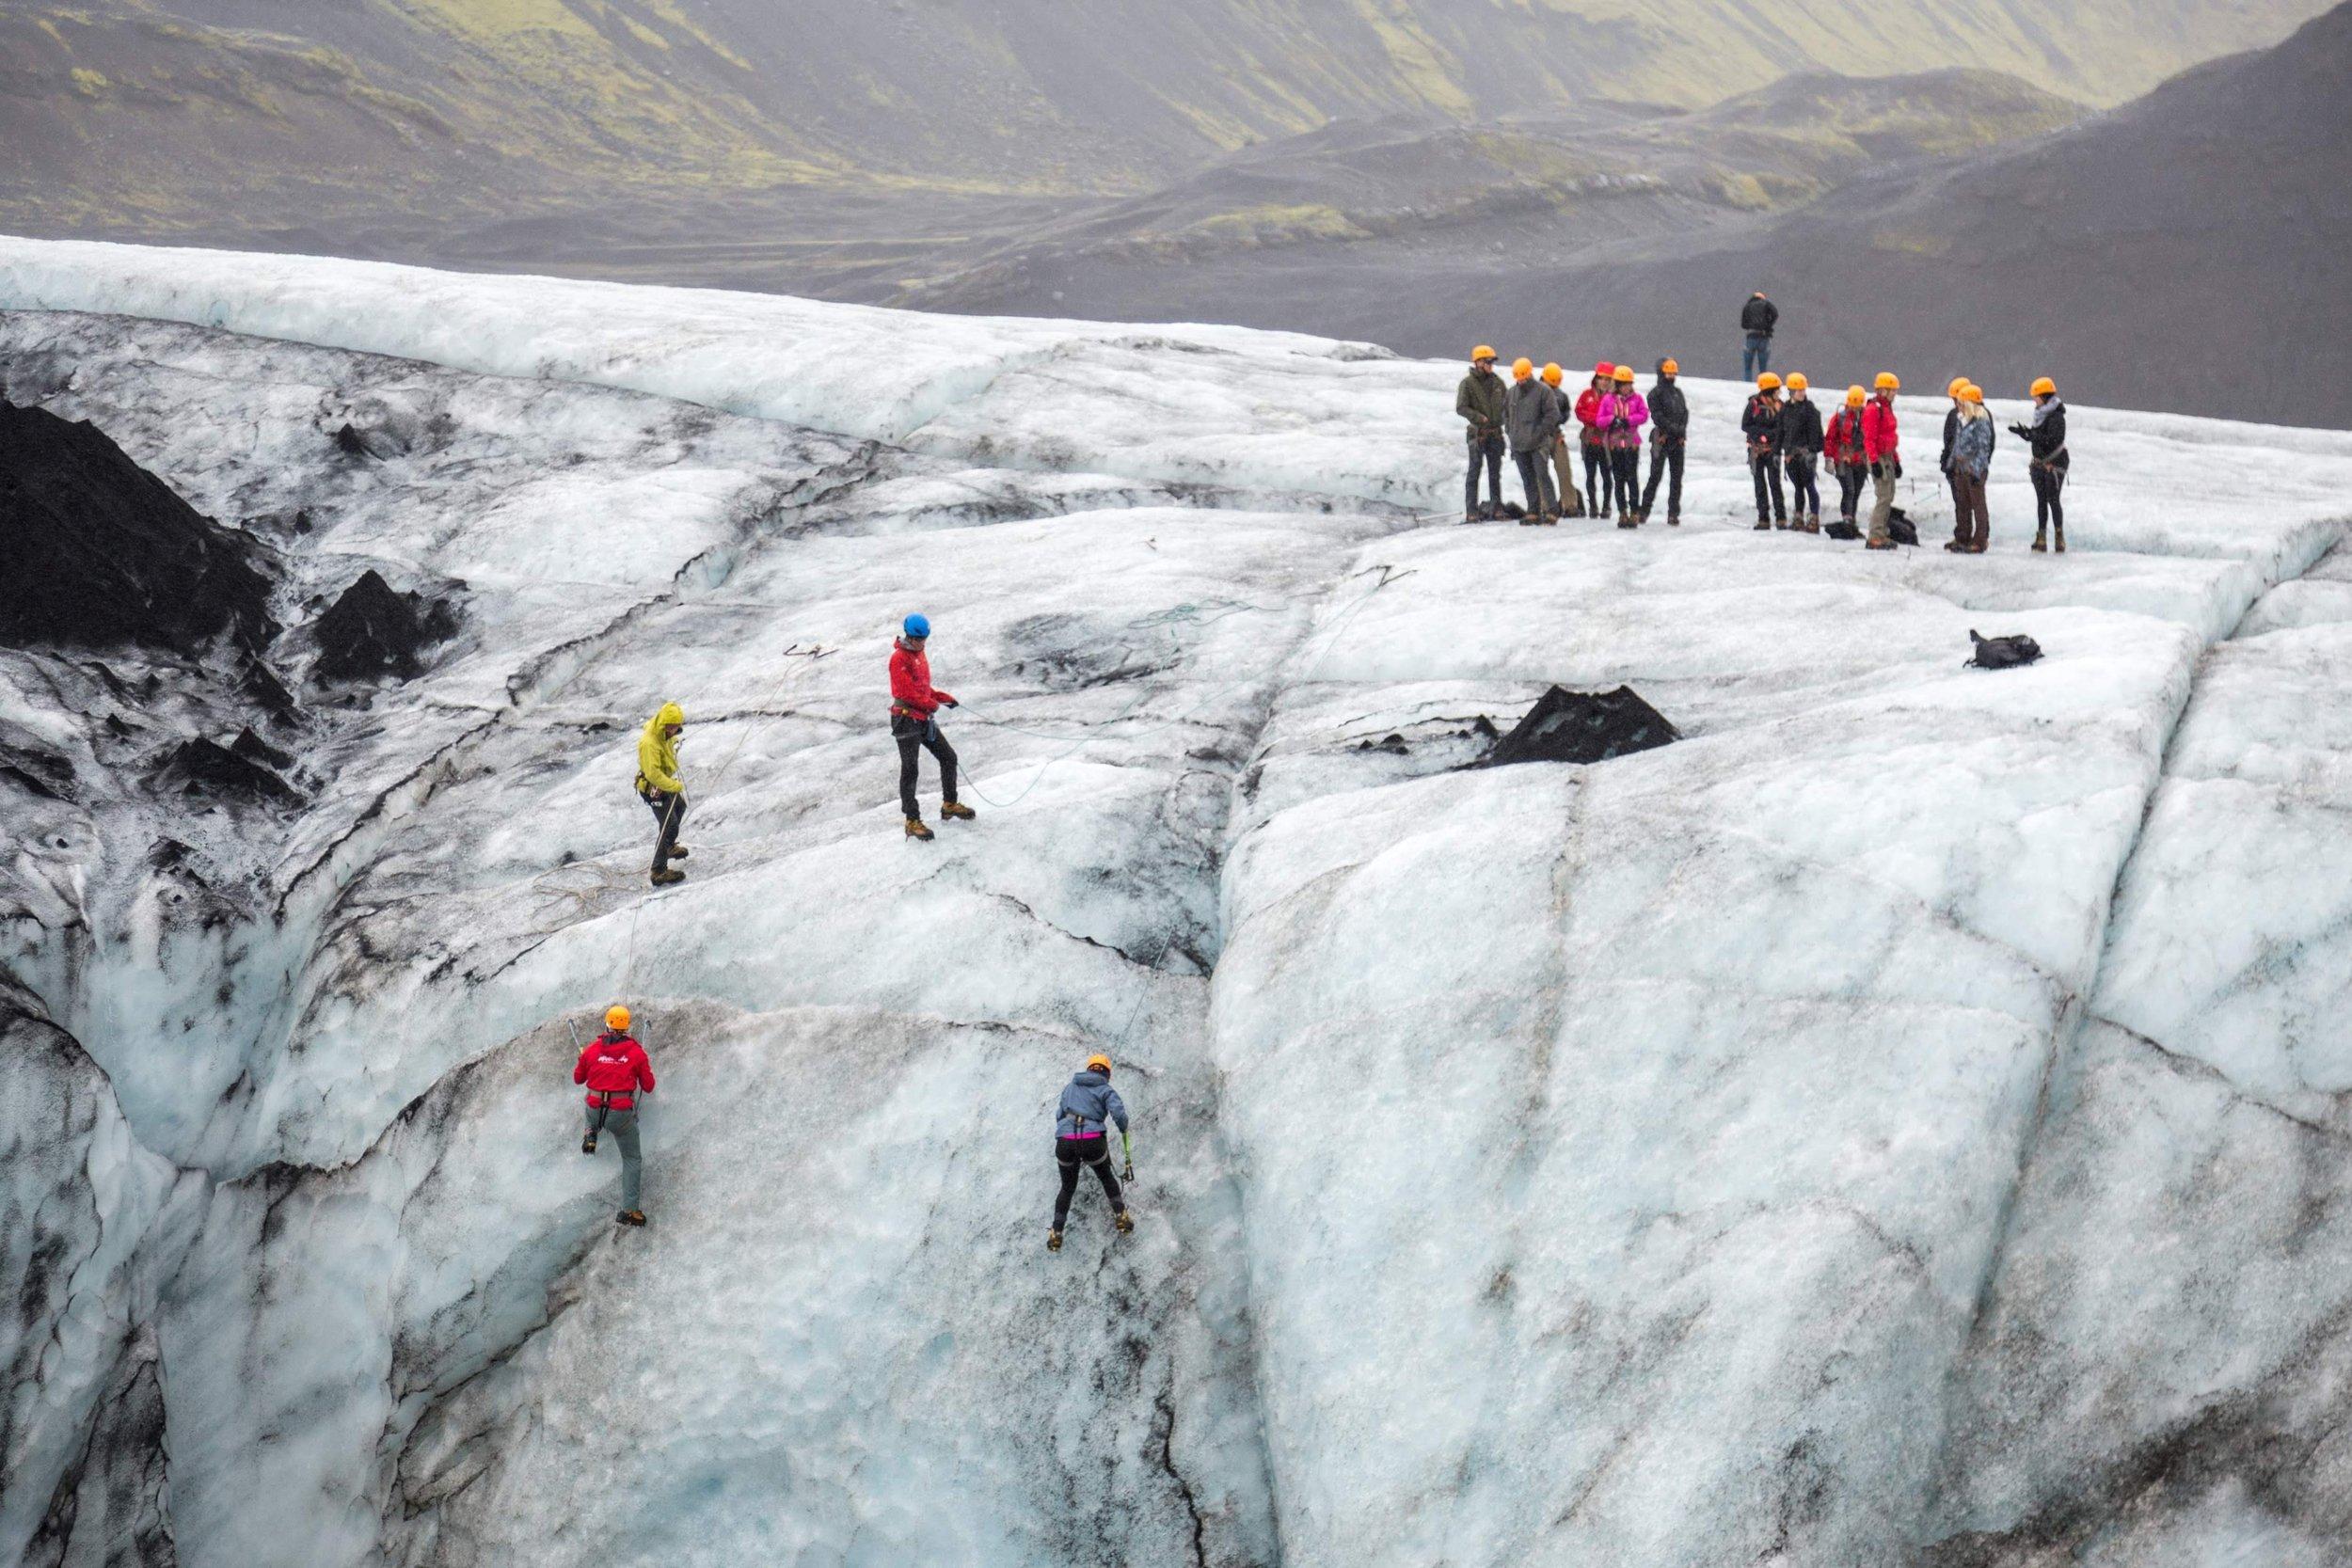 iceland voyedge rx tour fitness excursion travel